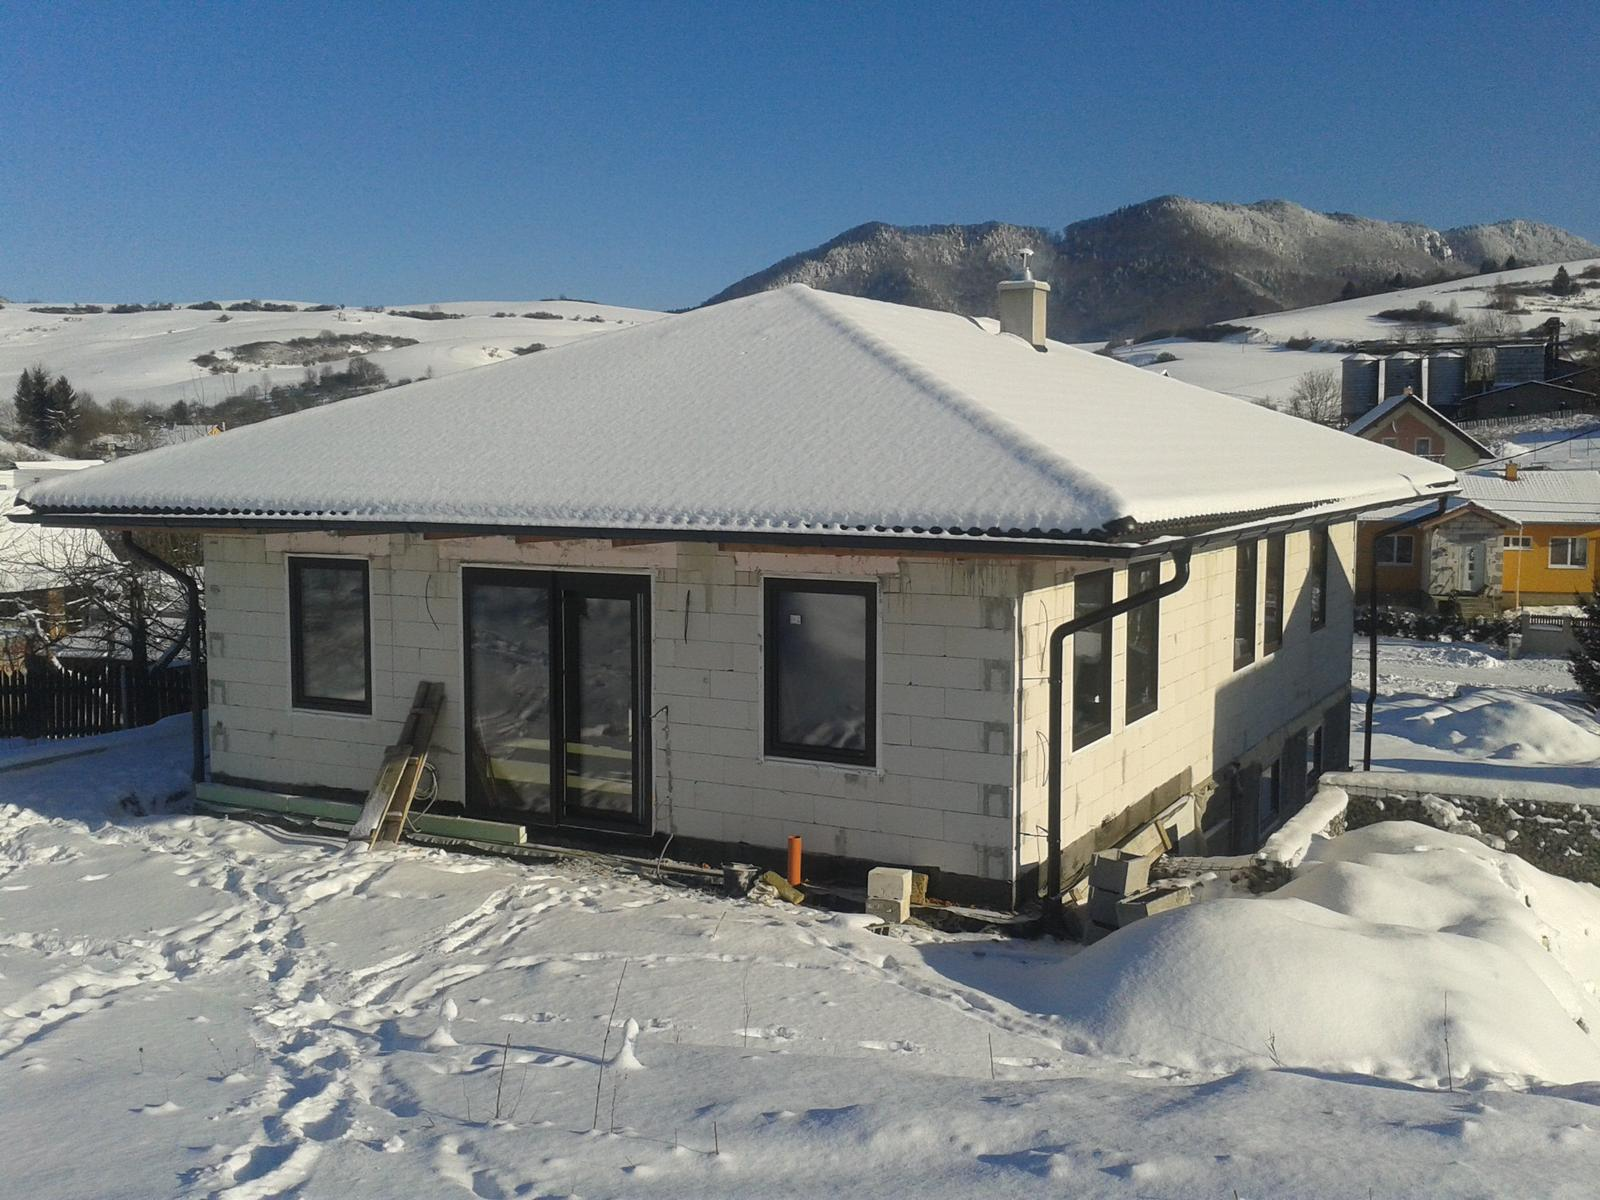 Náš domčok - domcekova druha zima